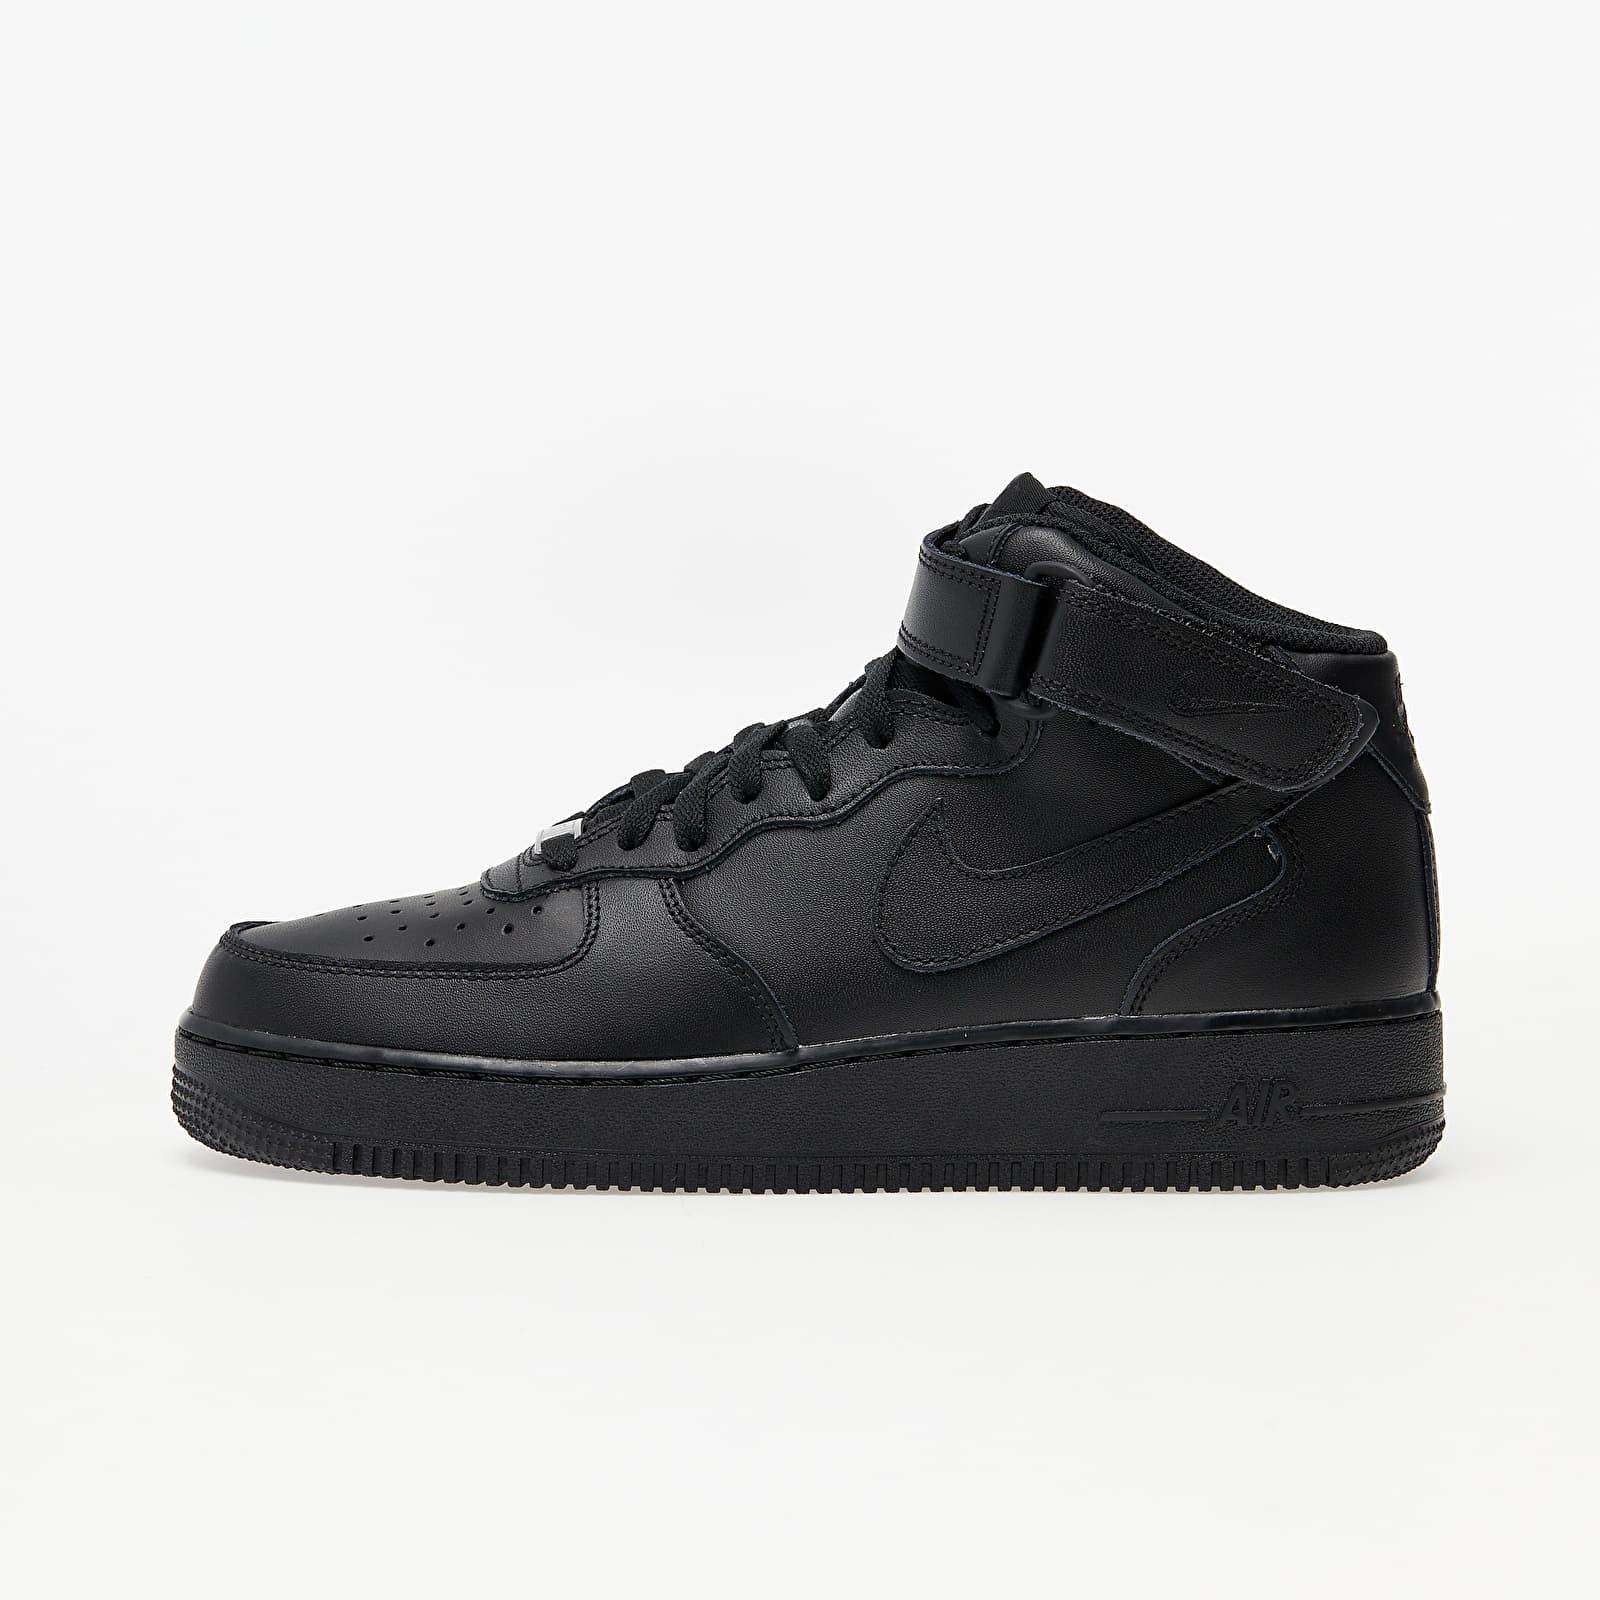 Nike Air Force 1 Mid '07 Black/ Black-Black EUR 44